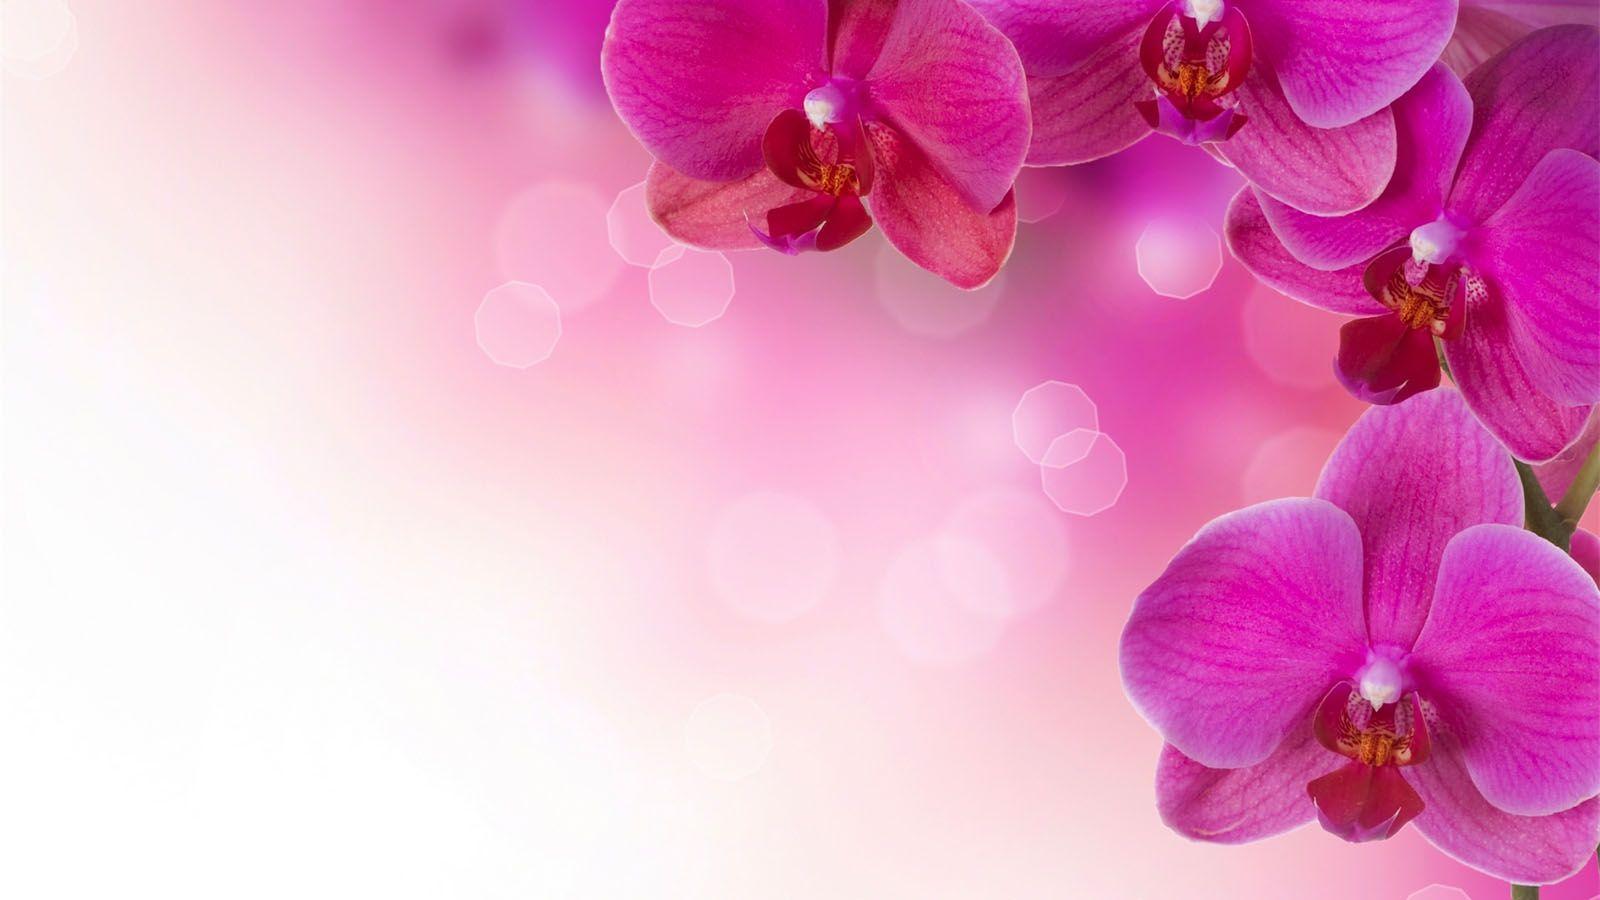 flower backgrounds | ... Pink Flower Background | wallpaper, wallpaper hd, background desktop